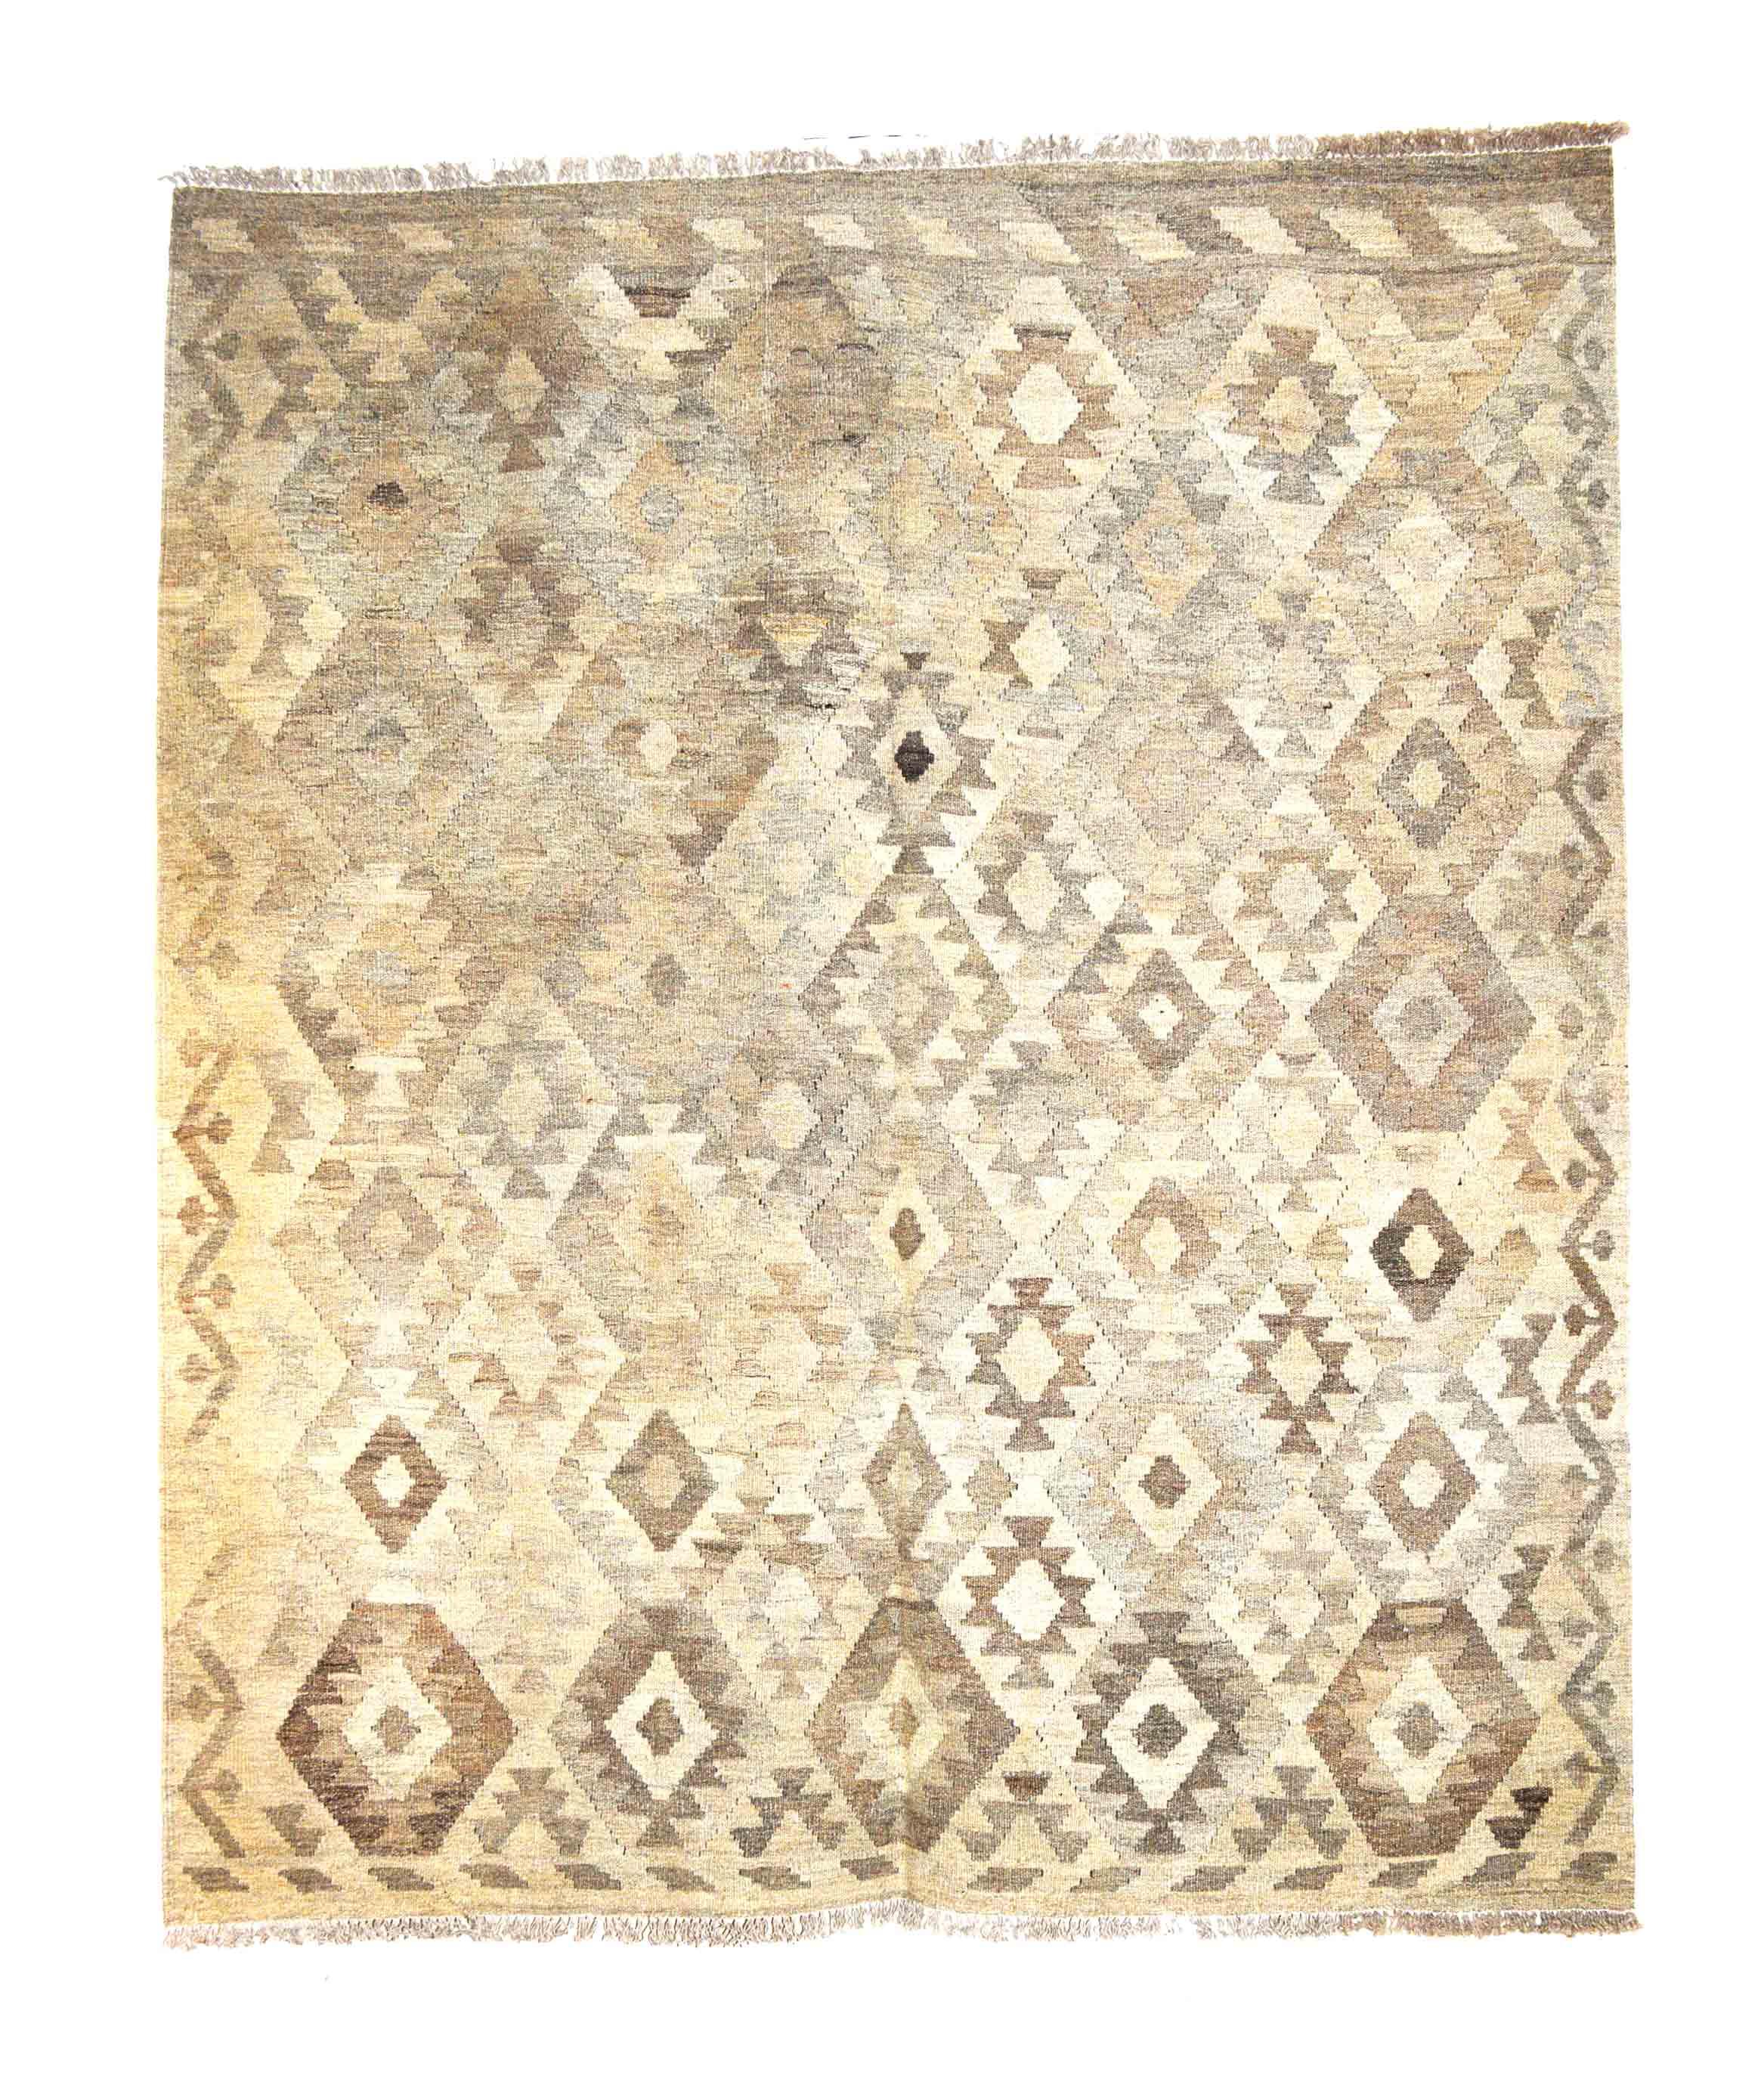 Kelim K13 - 193 x 165 cm